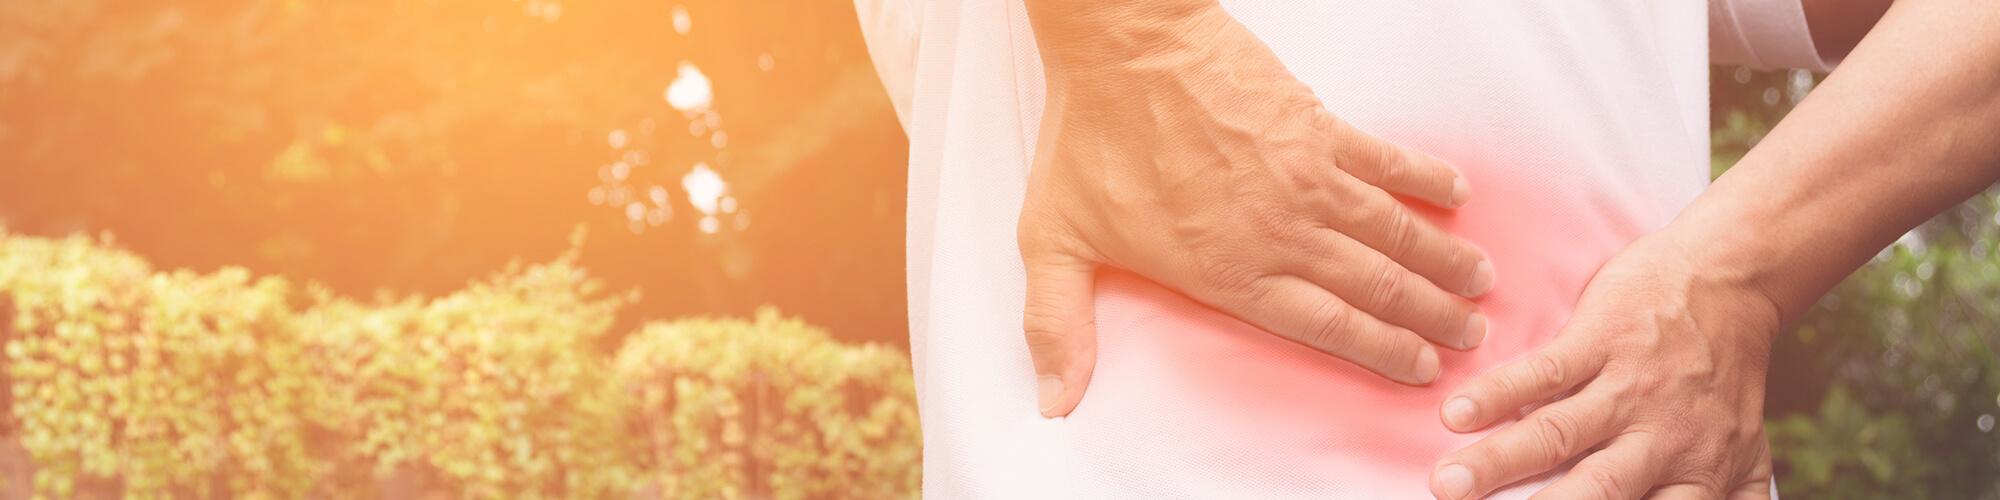 What is Arizona Chiropractic?